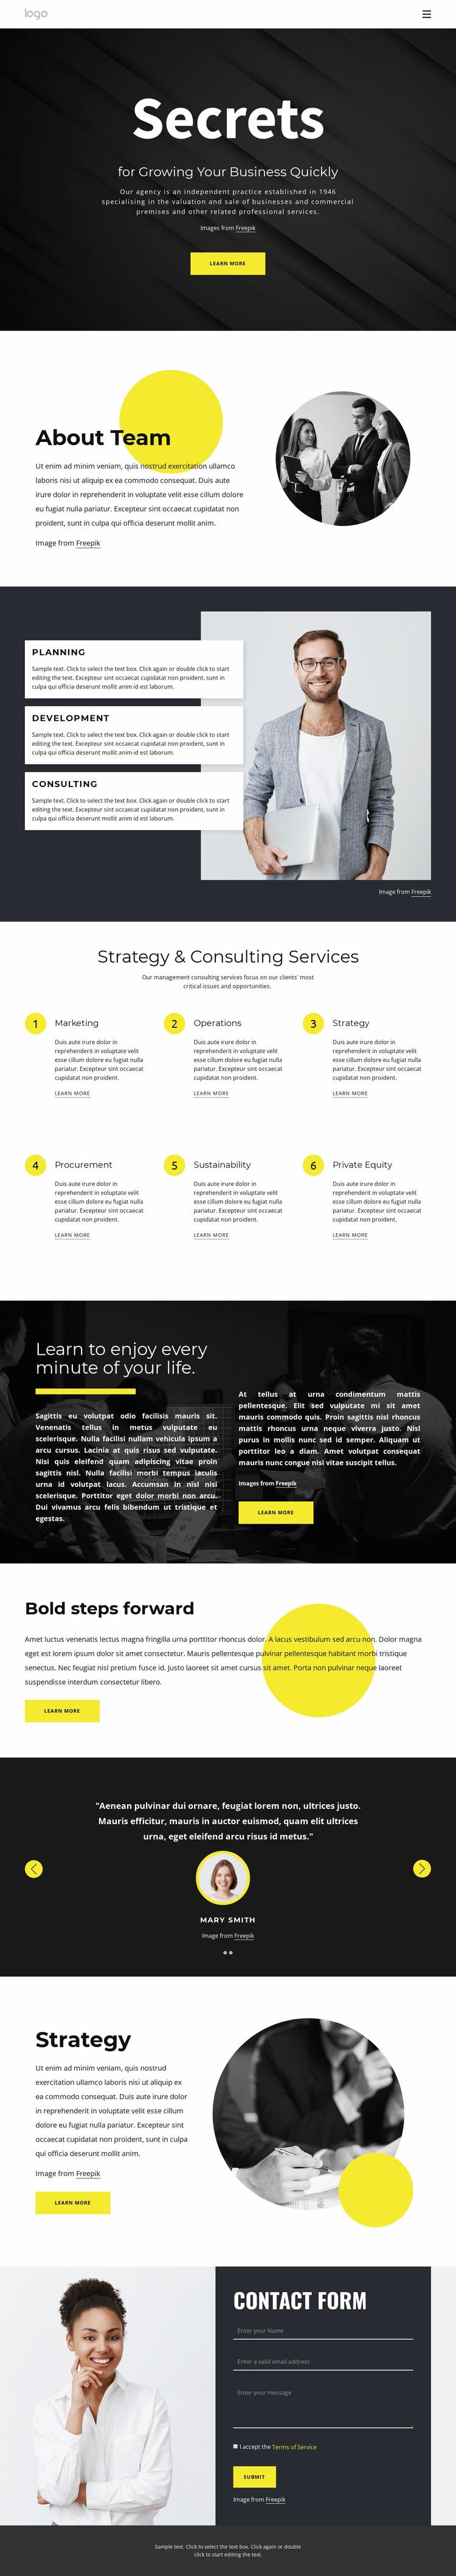 Secrets of growing business Website Design